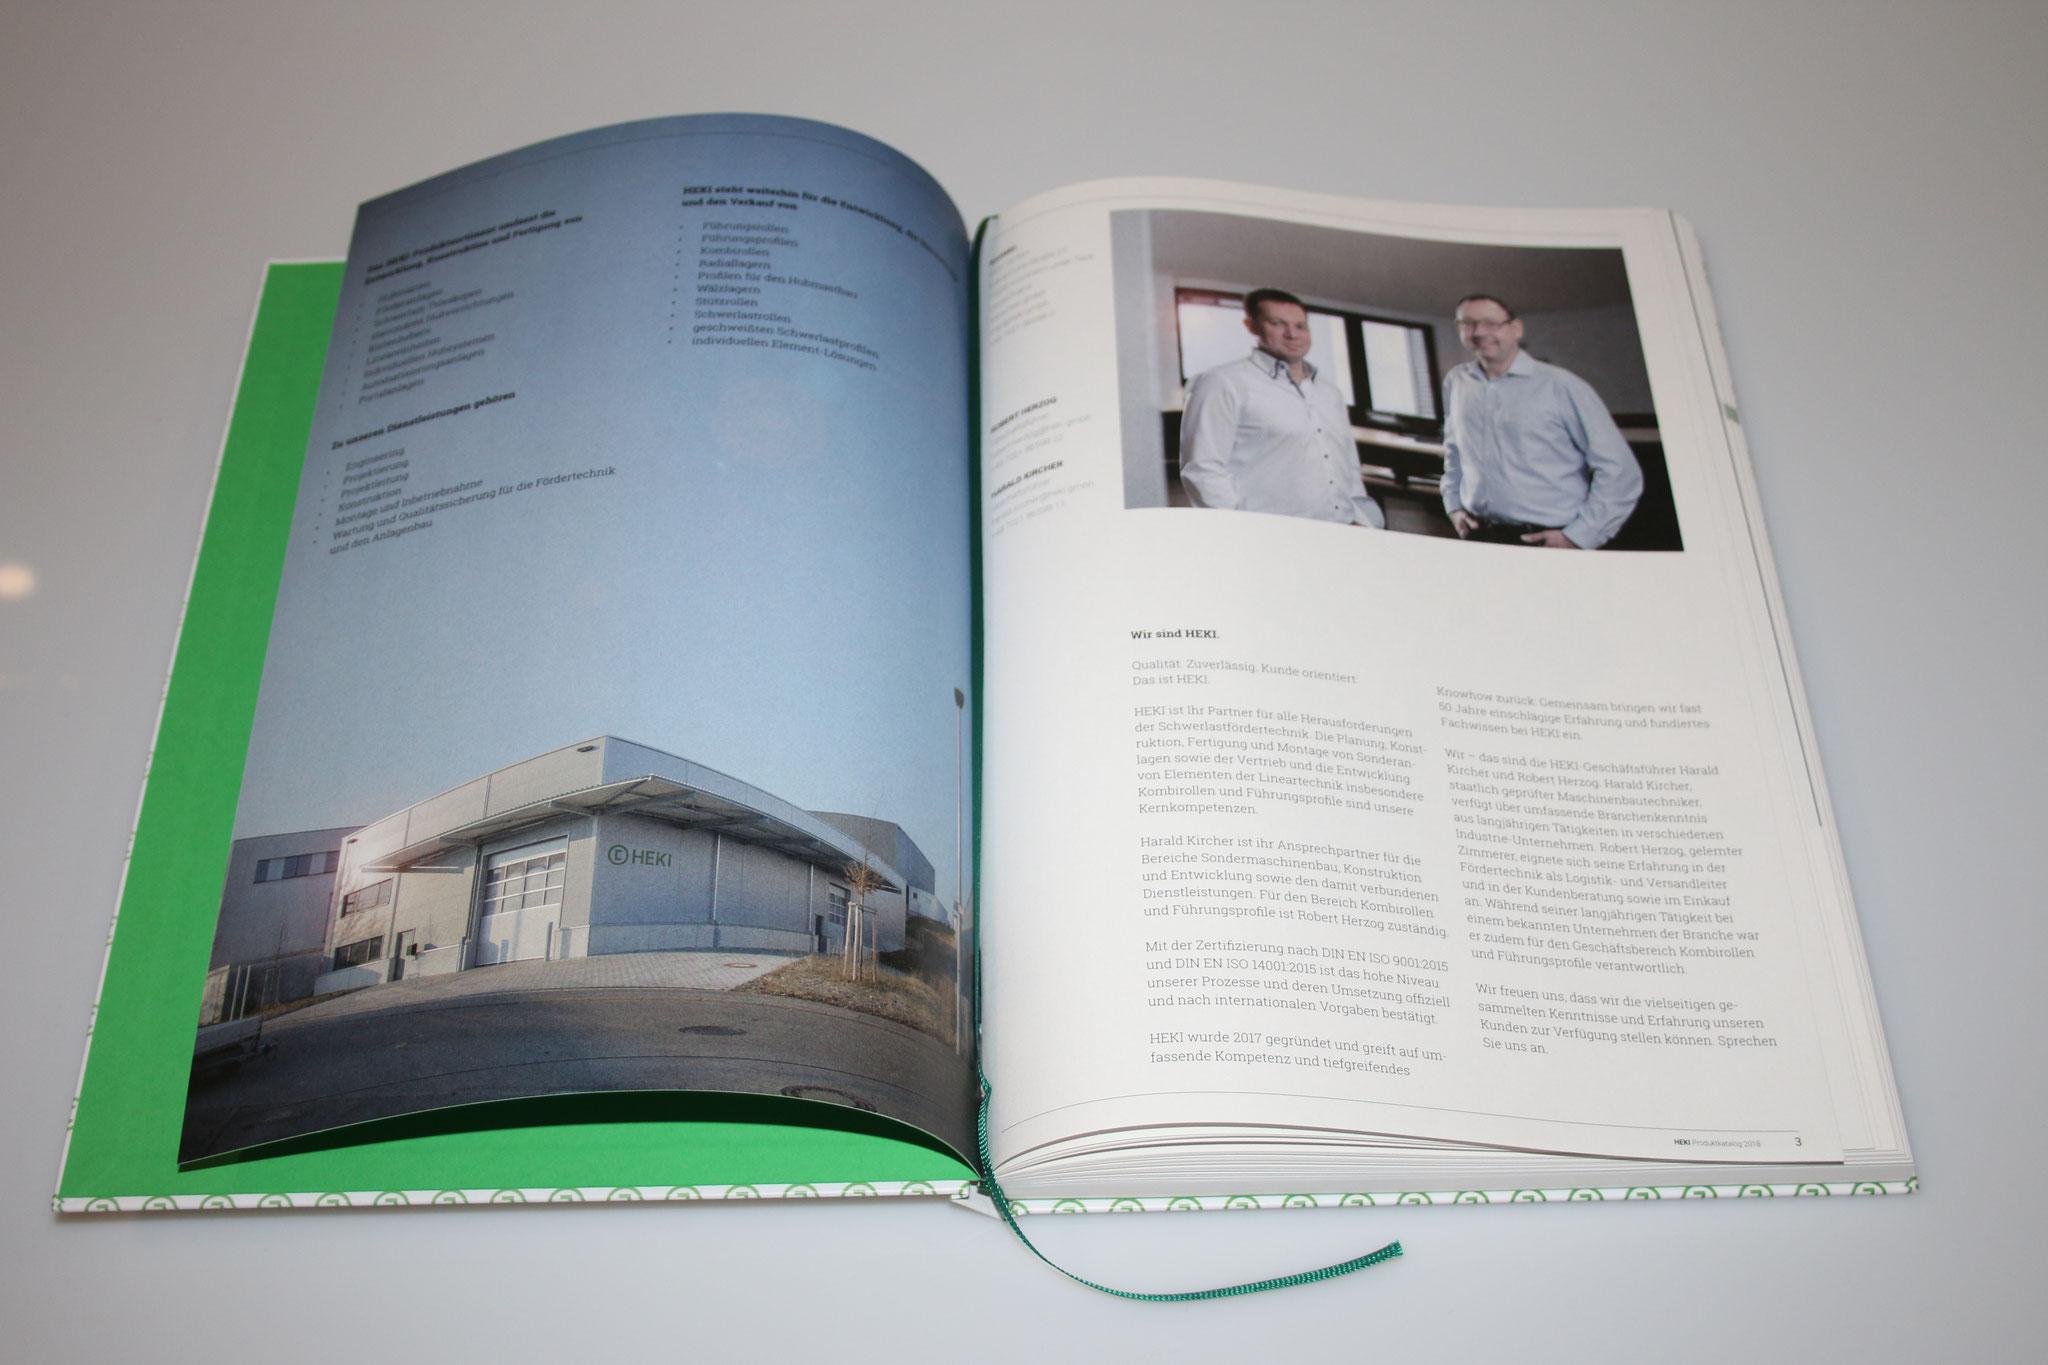 Auflage 100 Stück, Fadenheftung, Digitaldruck, Hardcover, Leseband